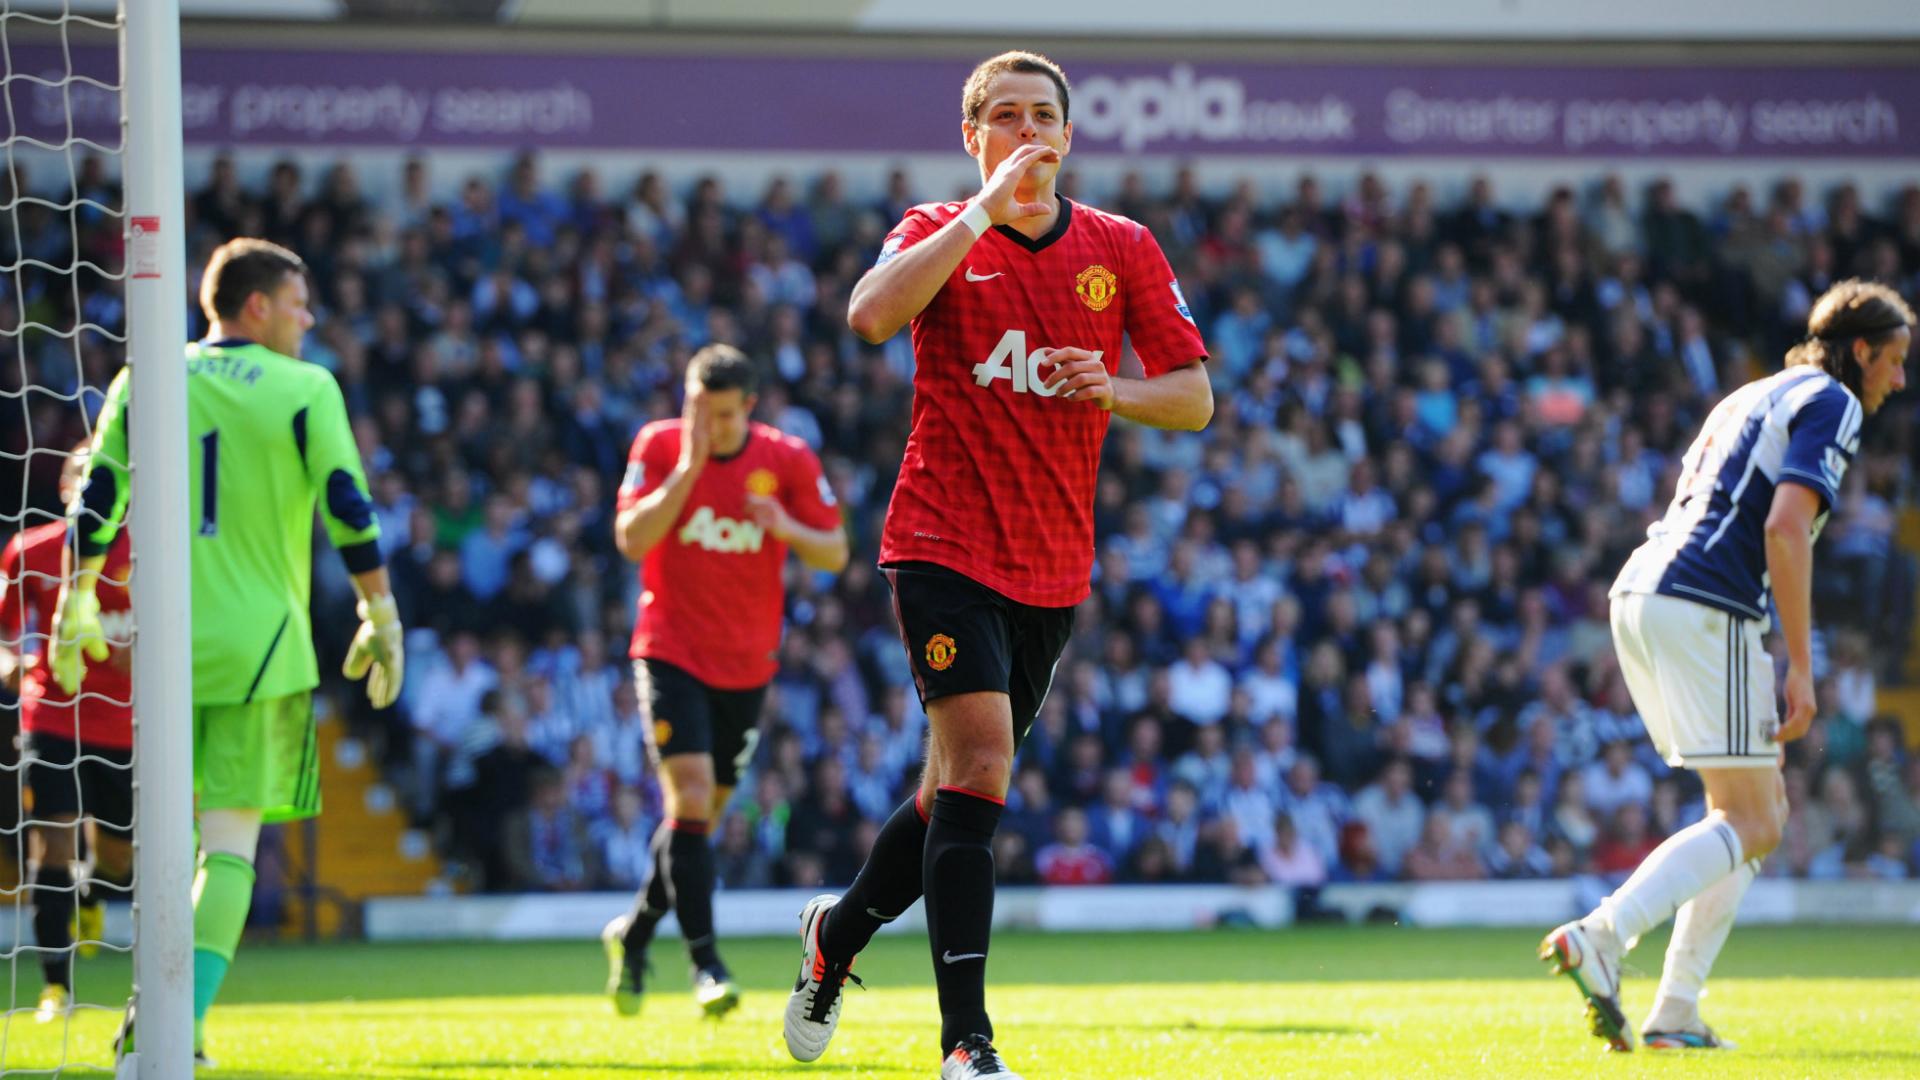 José Mourinho y su retador mensaje a Arsene Wenger — Manchester United